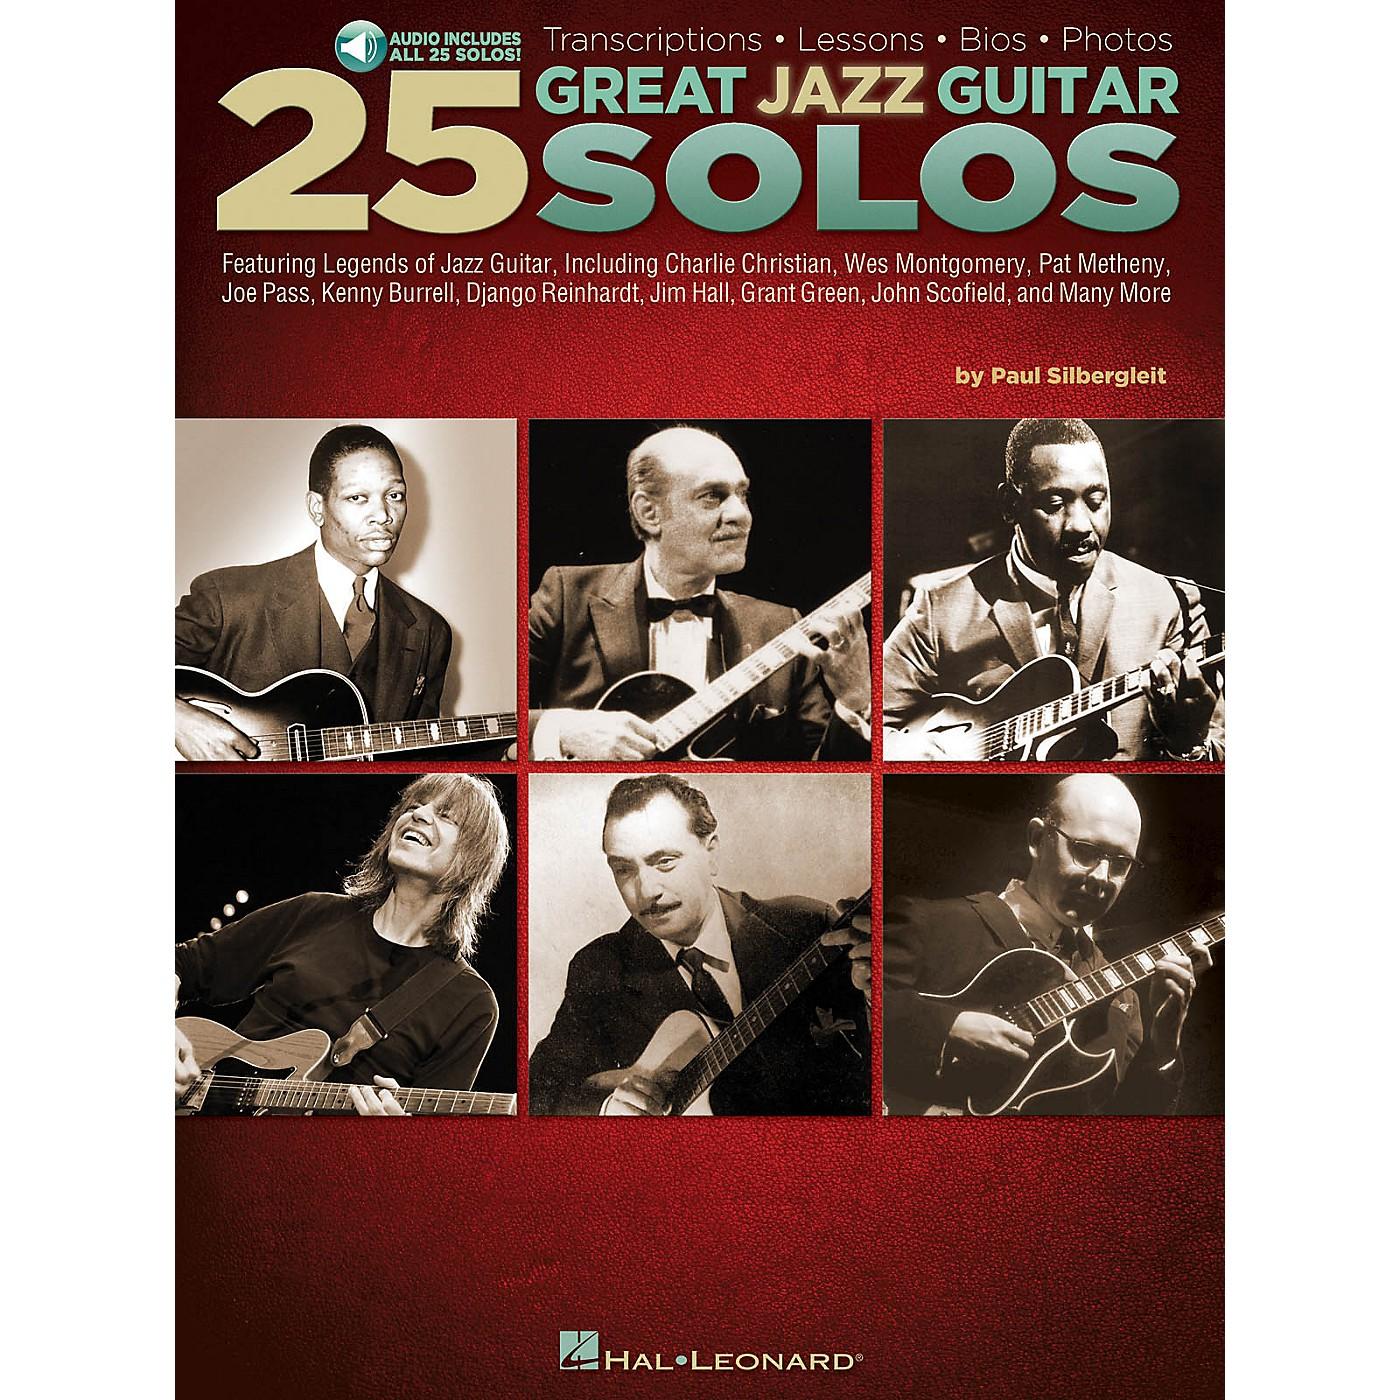 Hal Leonard 25 Great Jazz Guitar Solos Guitar Book Series Softcover Audio Online Written by Paul Silbergleit thumbnail